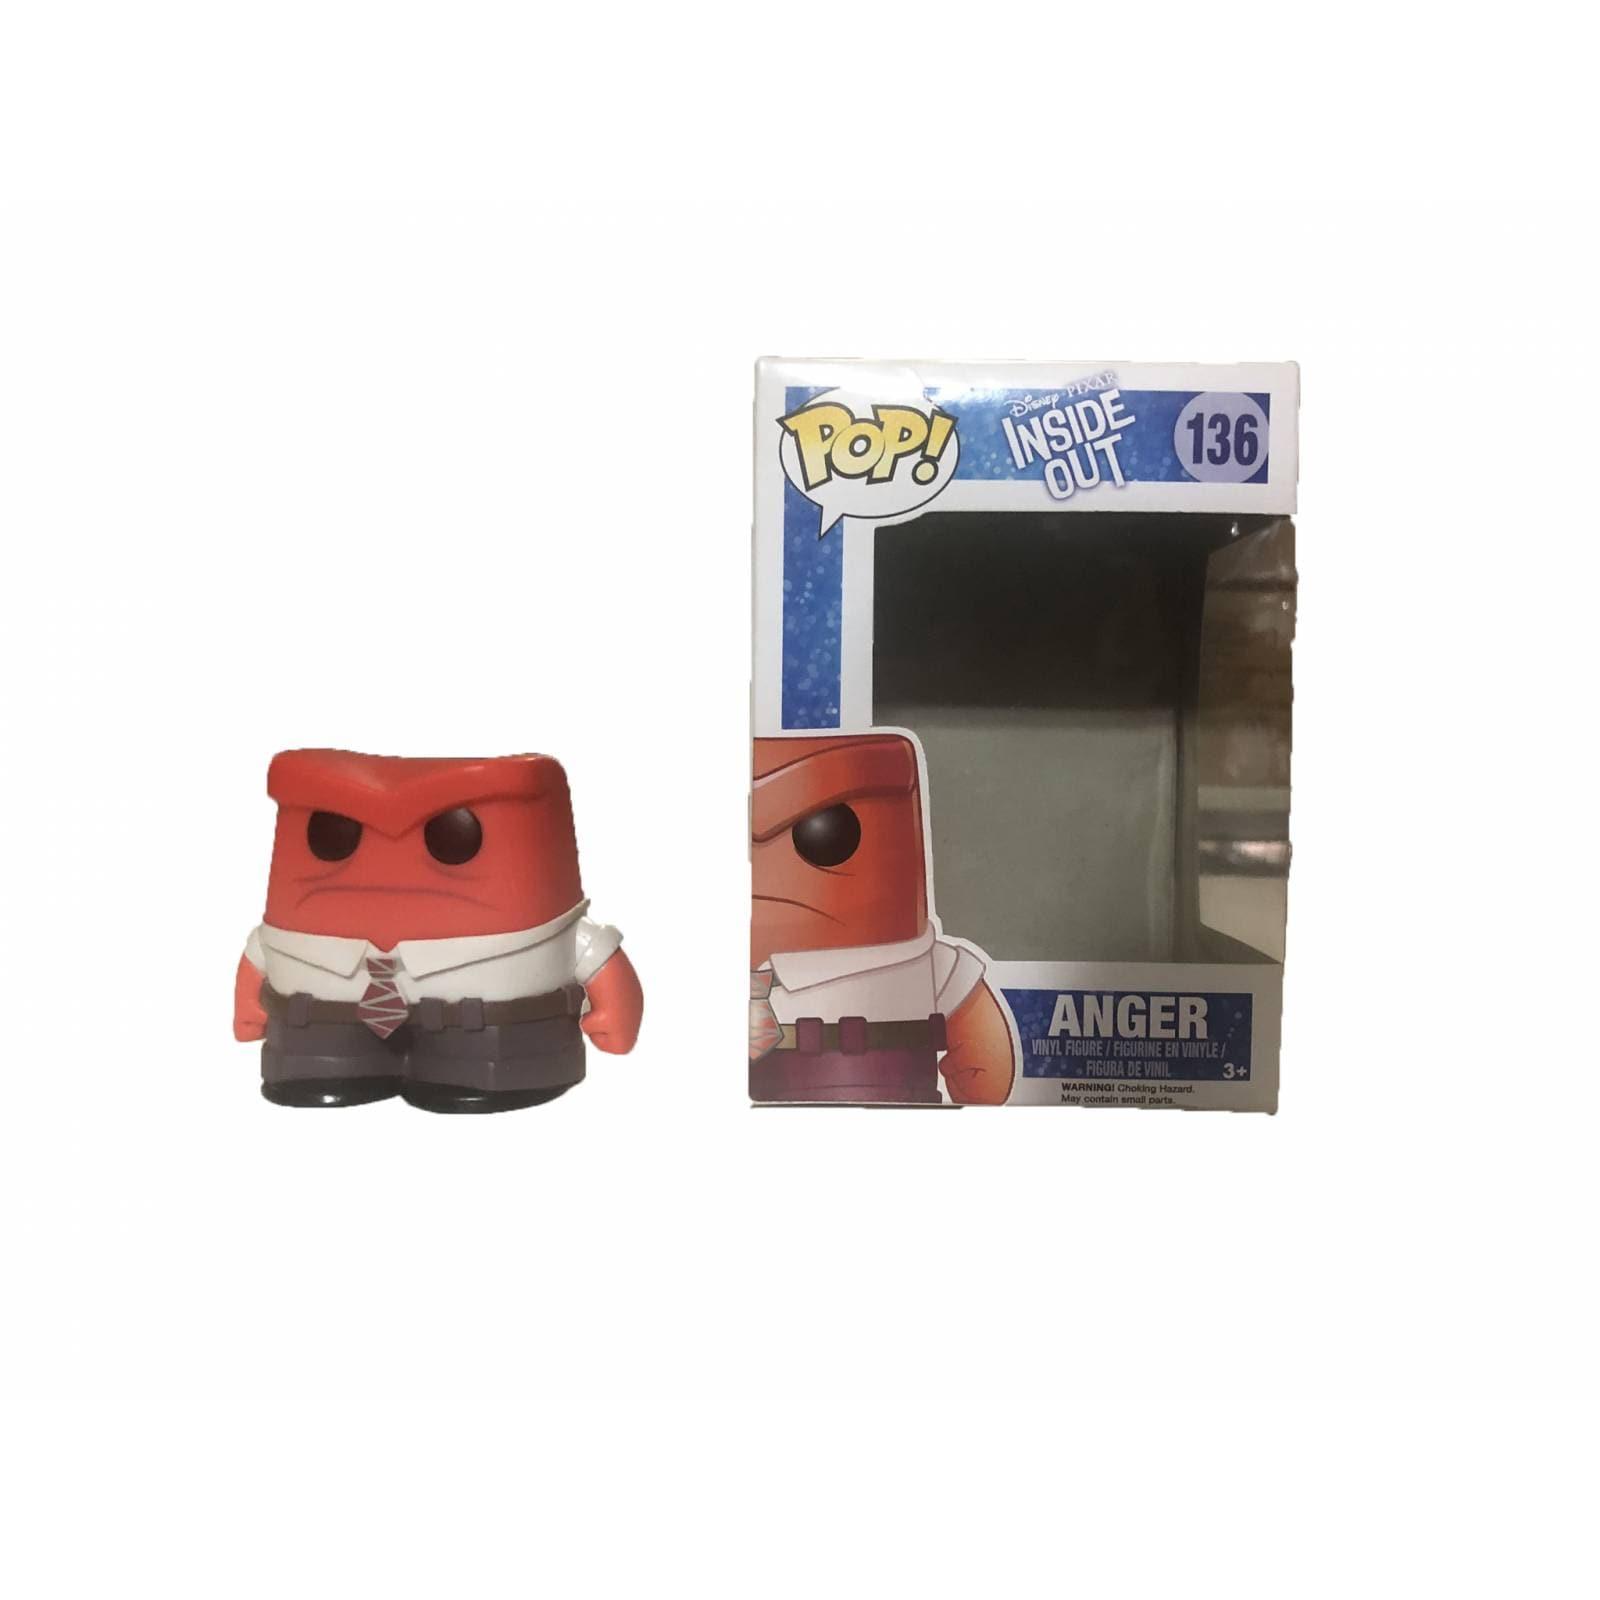 Figura Funko Pop! Coleccionable Juguete Disney Pixar - Intensamente Inside Out 136 Anger Enojo